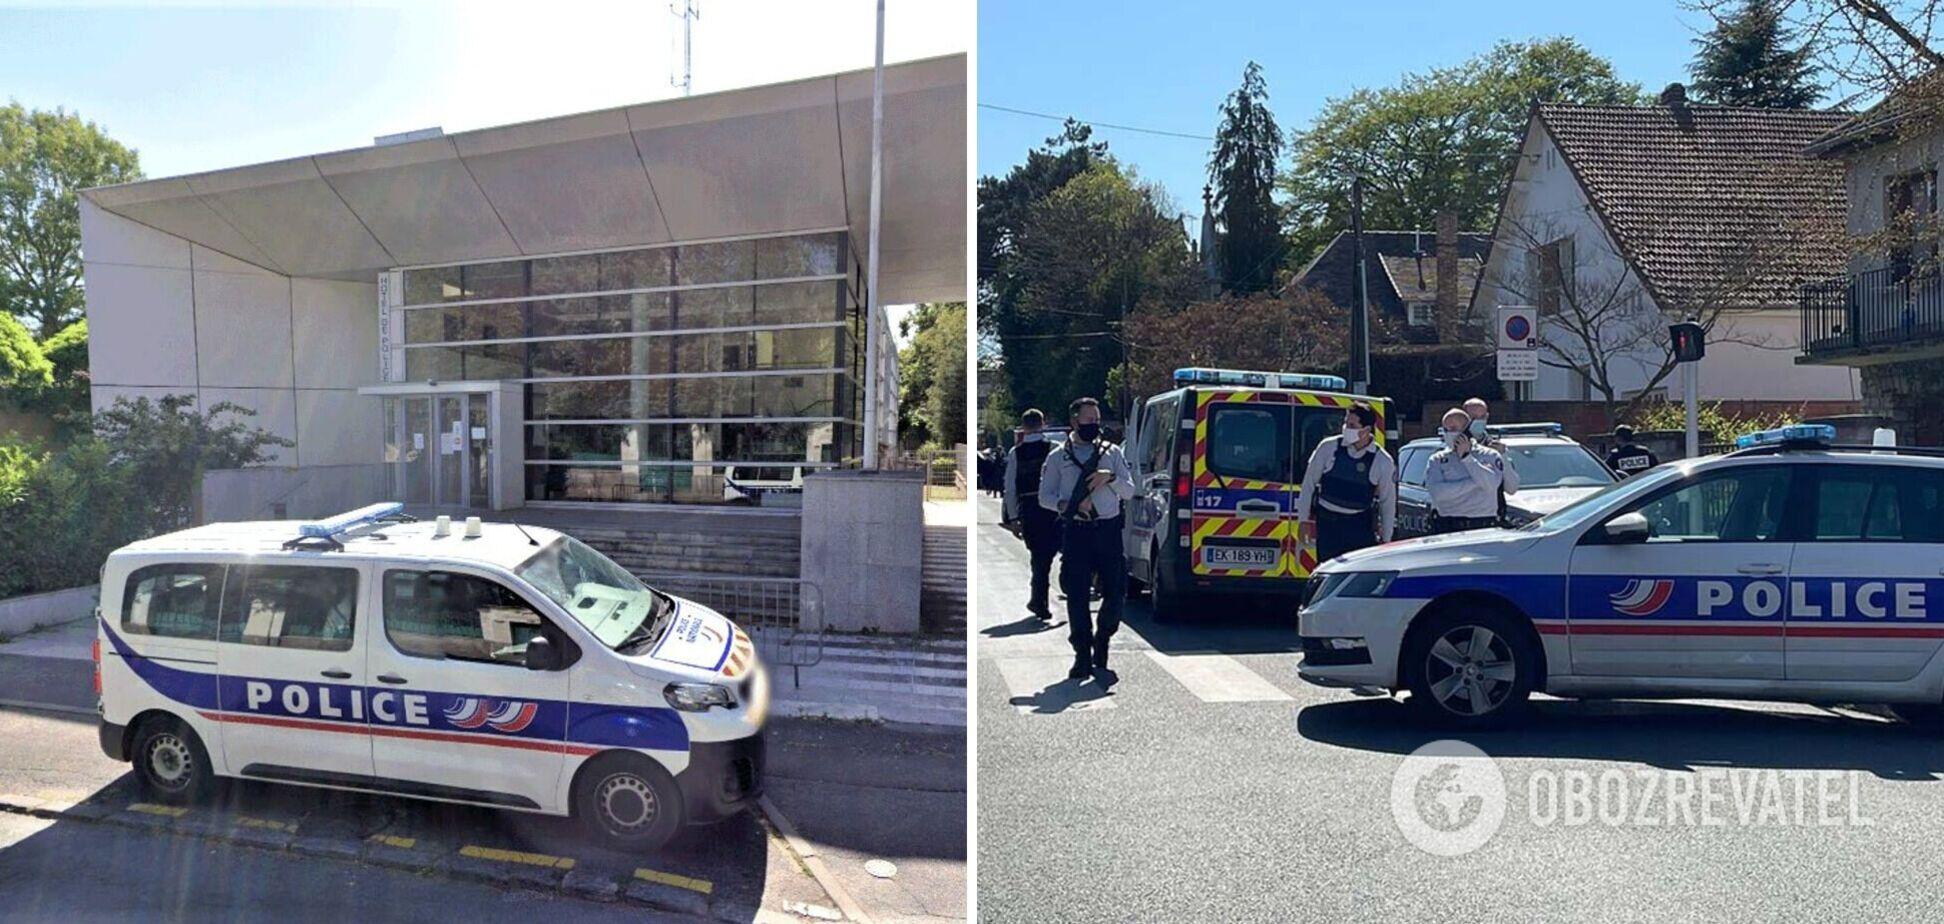 Нападение на полицейскую во Франции